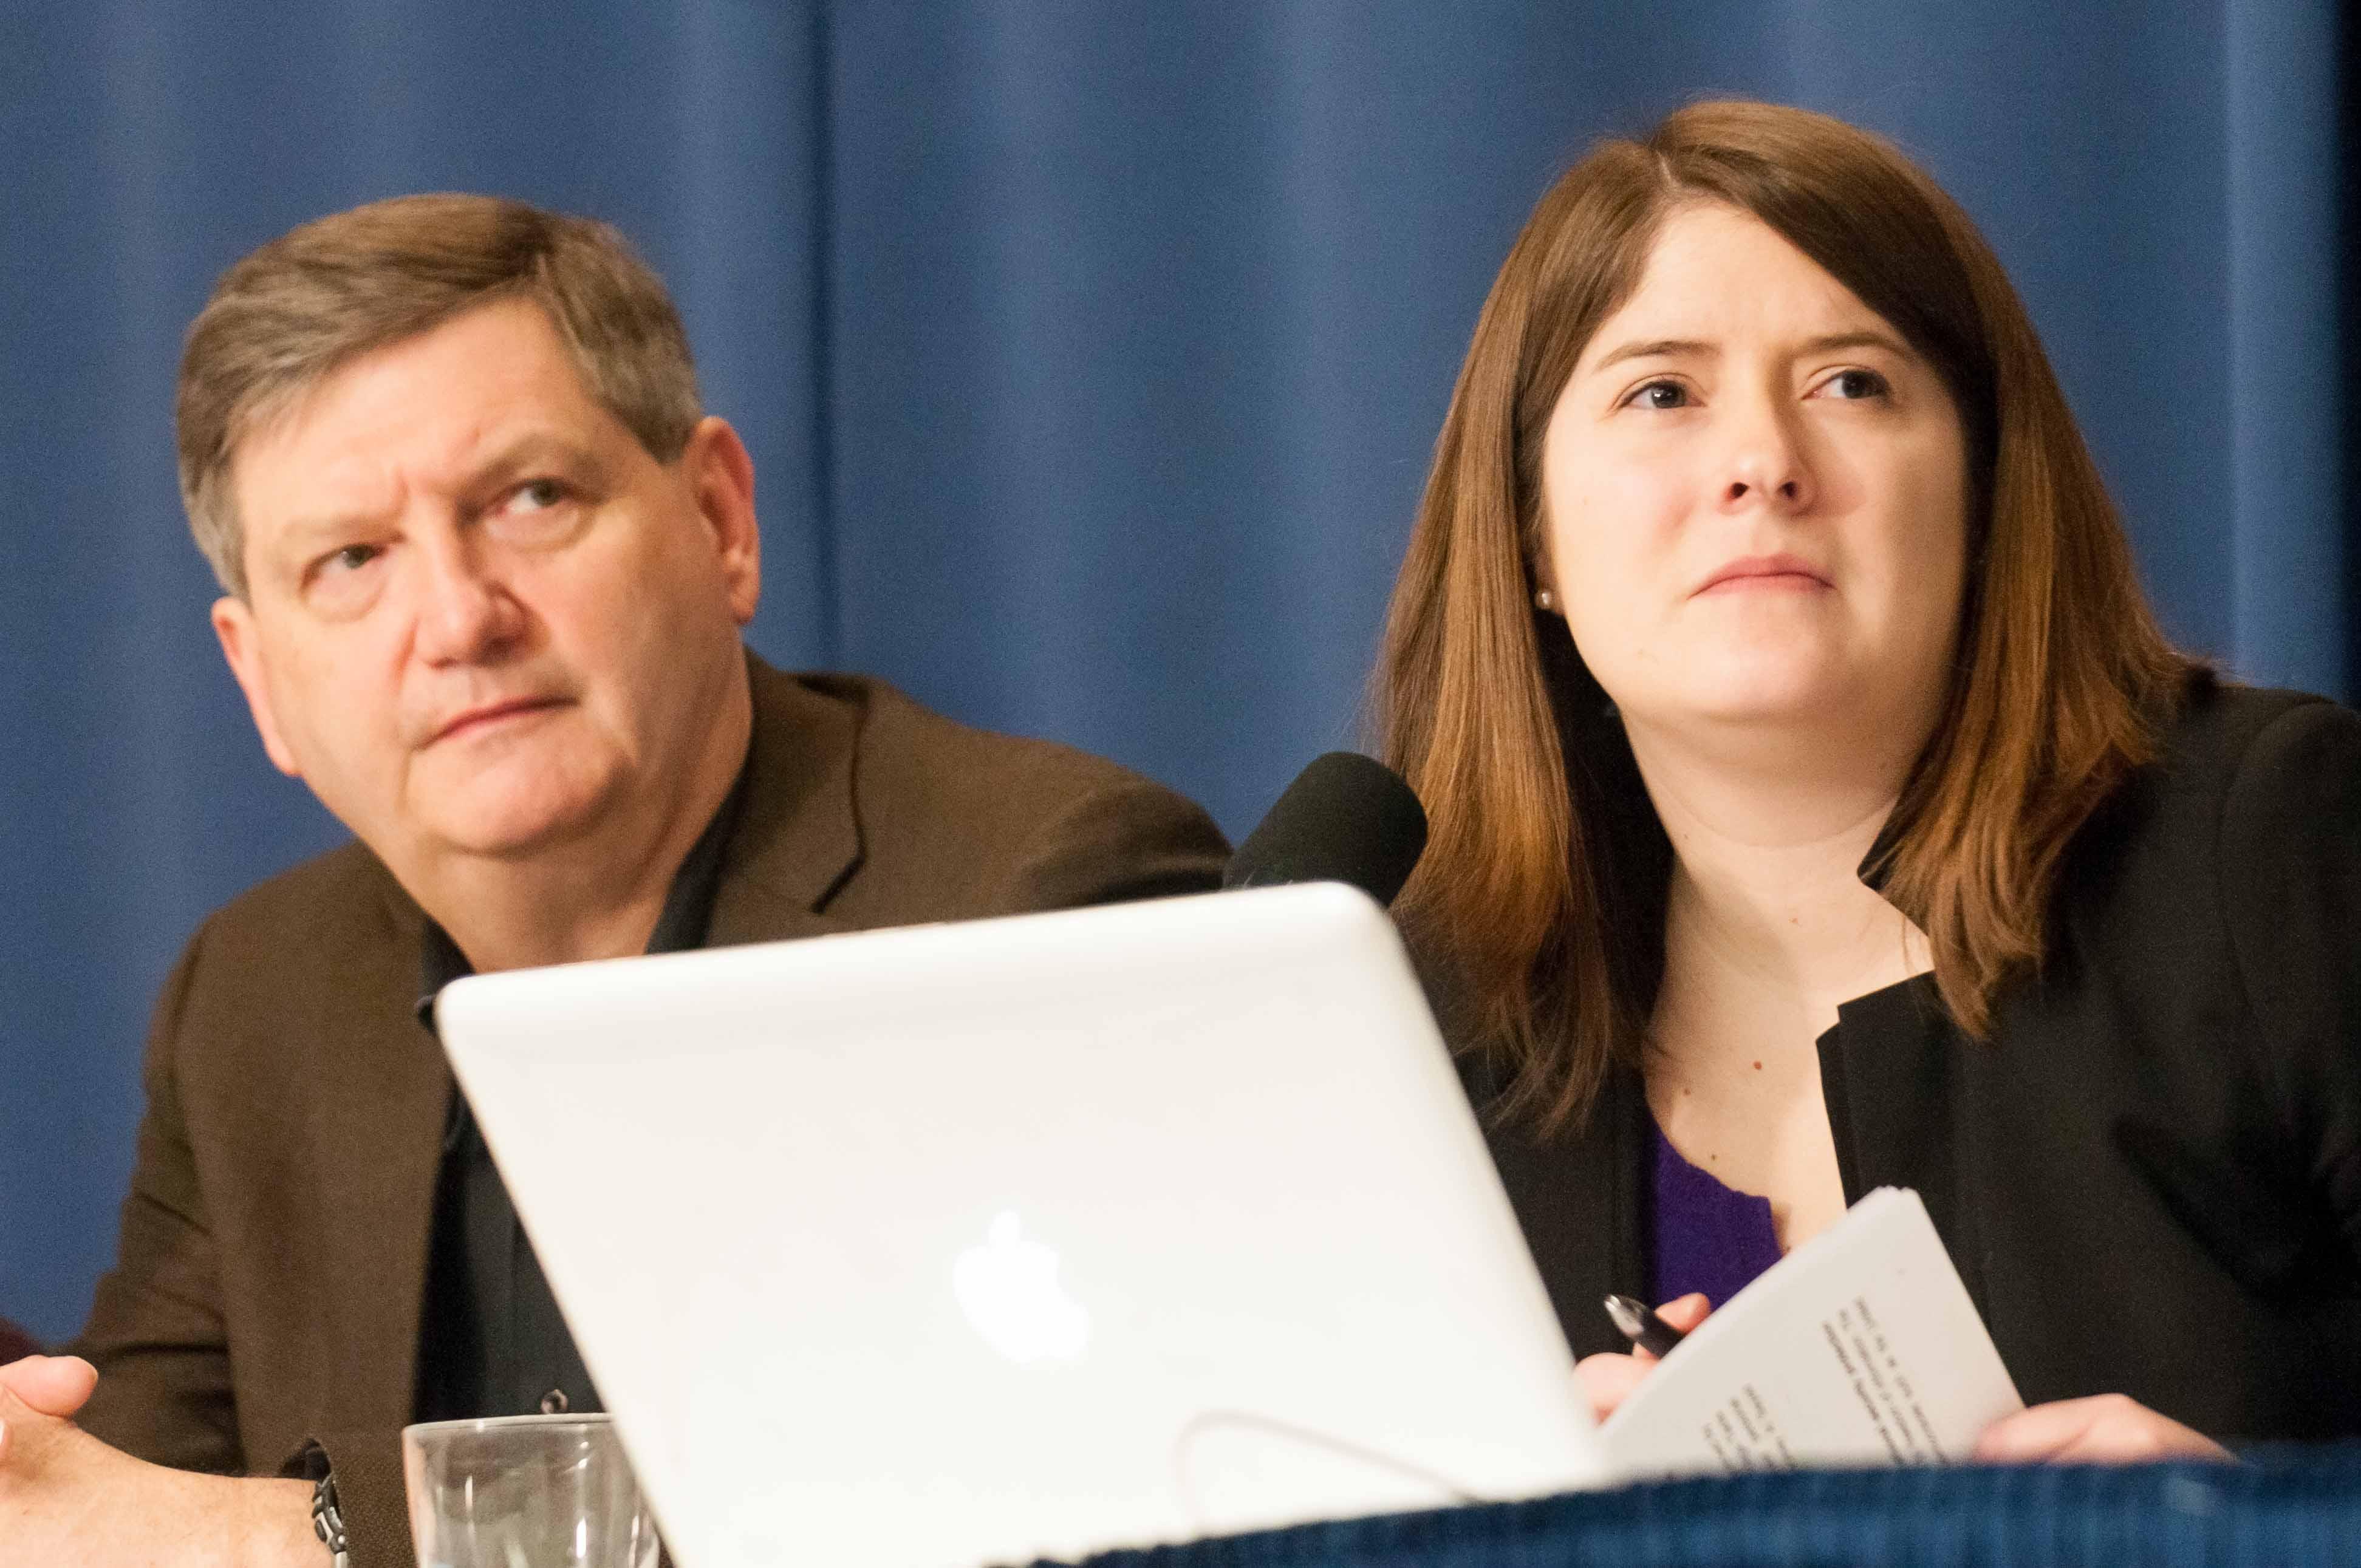 James Risen and Delphine Halgand at National Press Club Feb. 11, 2014